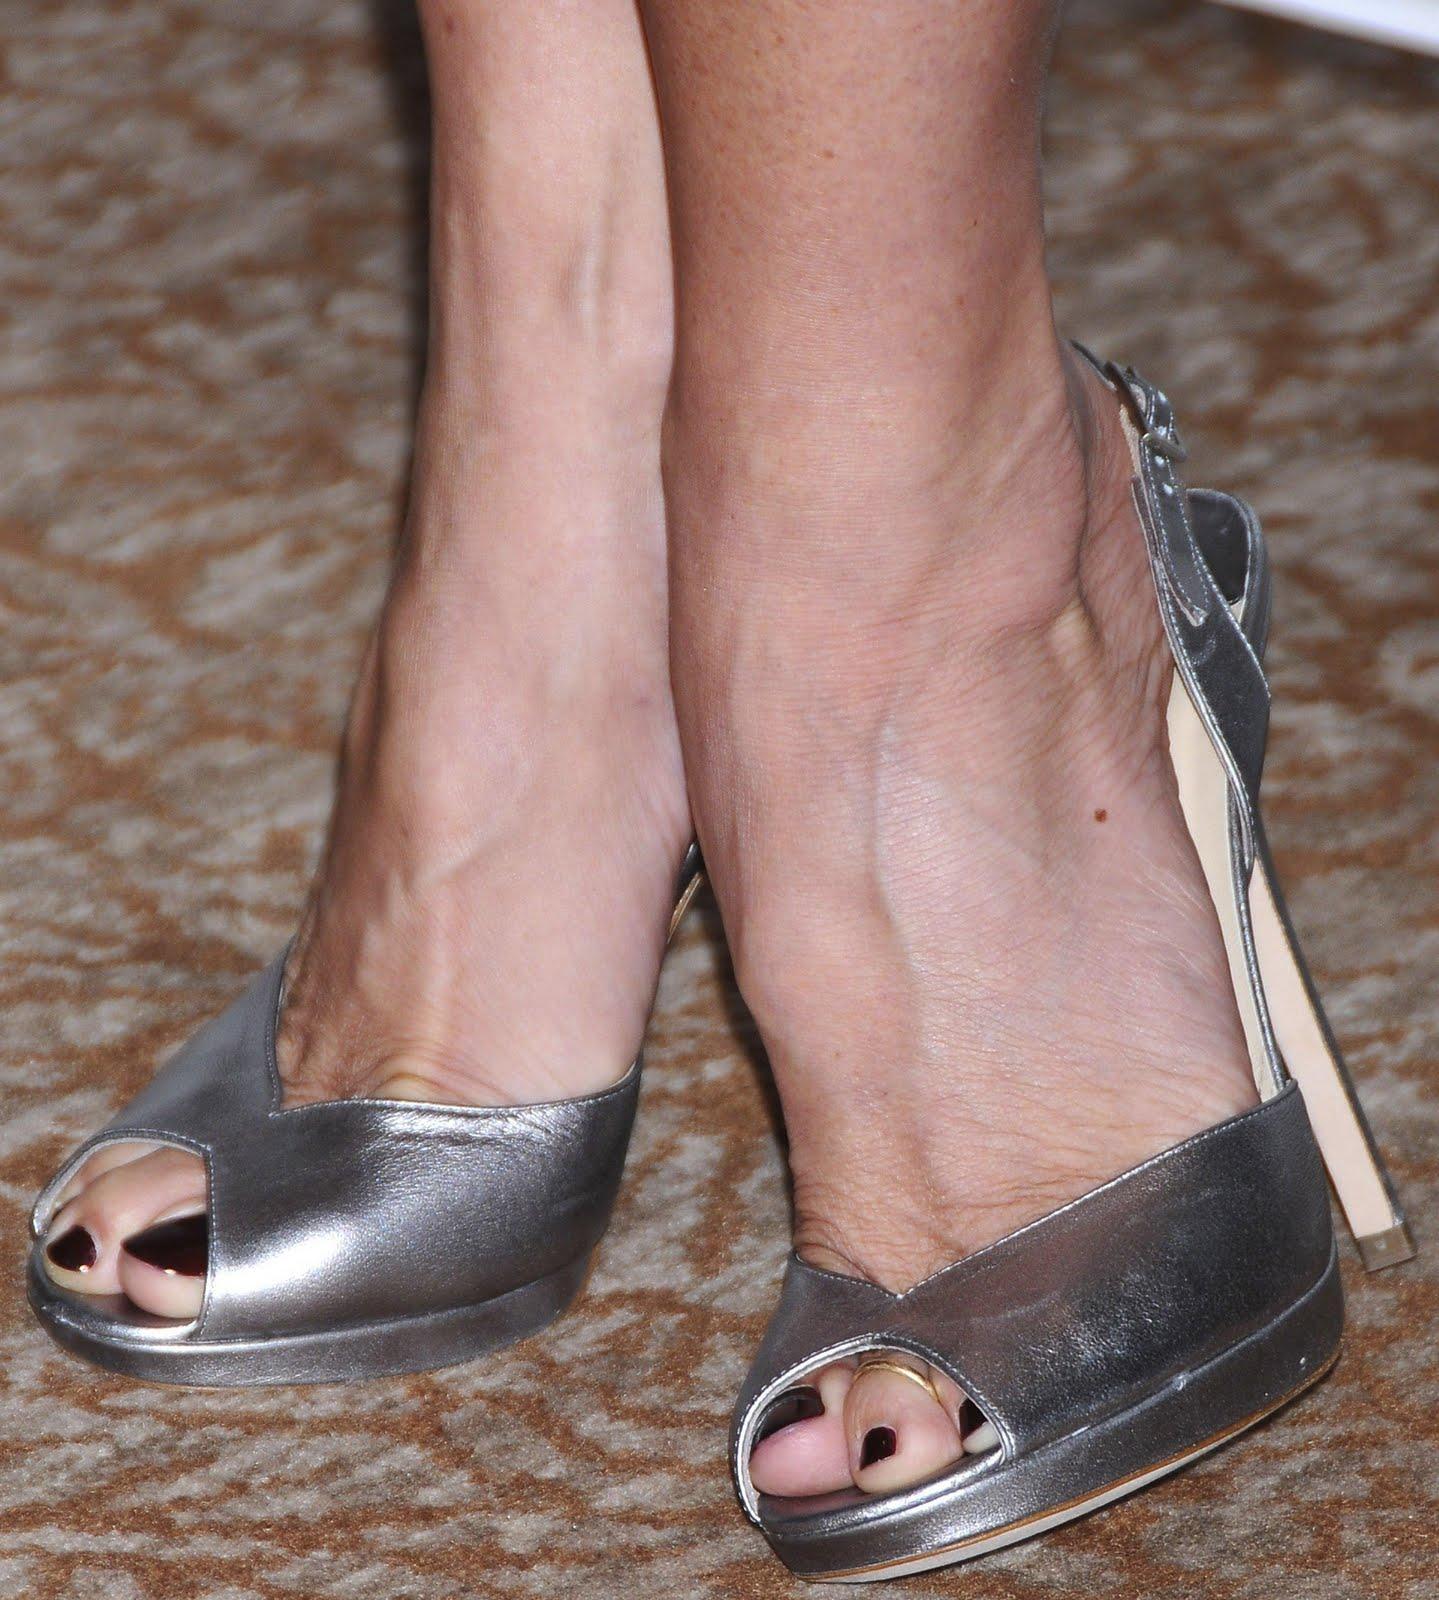 Feet nicole sheridan congratulate